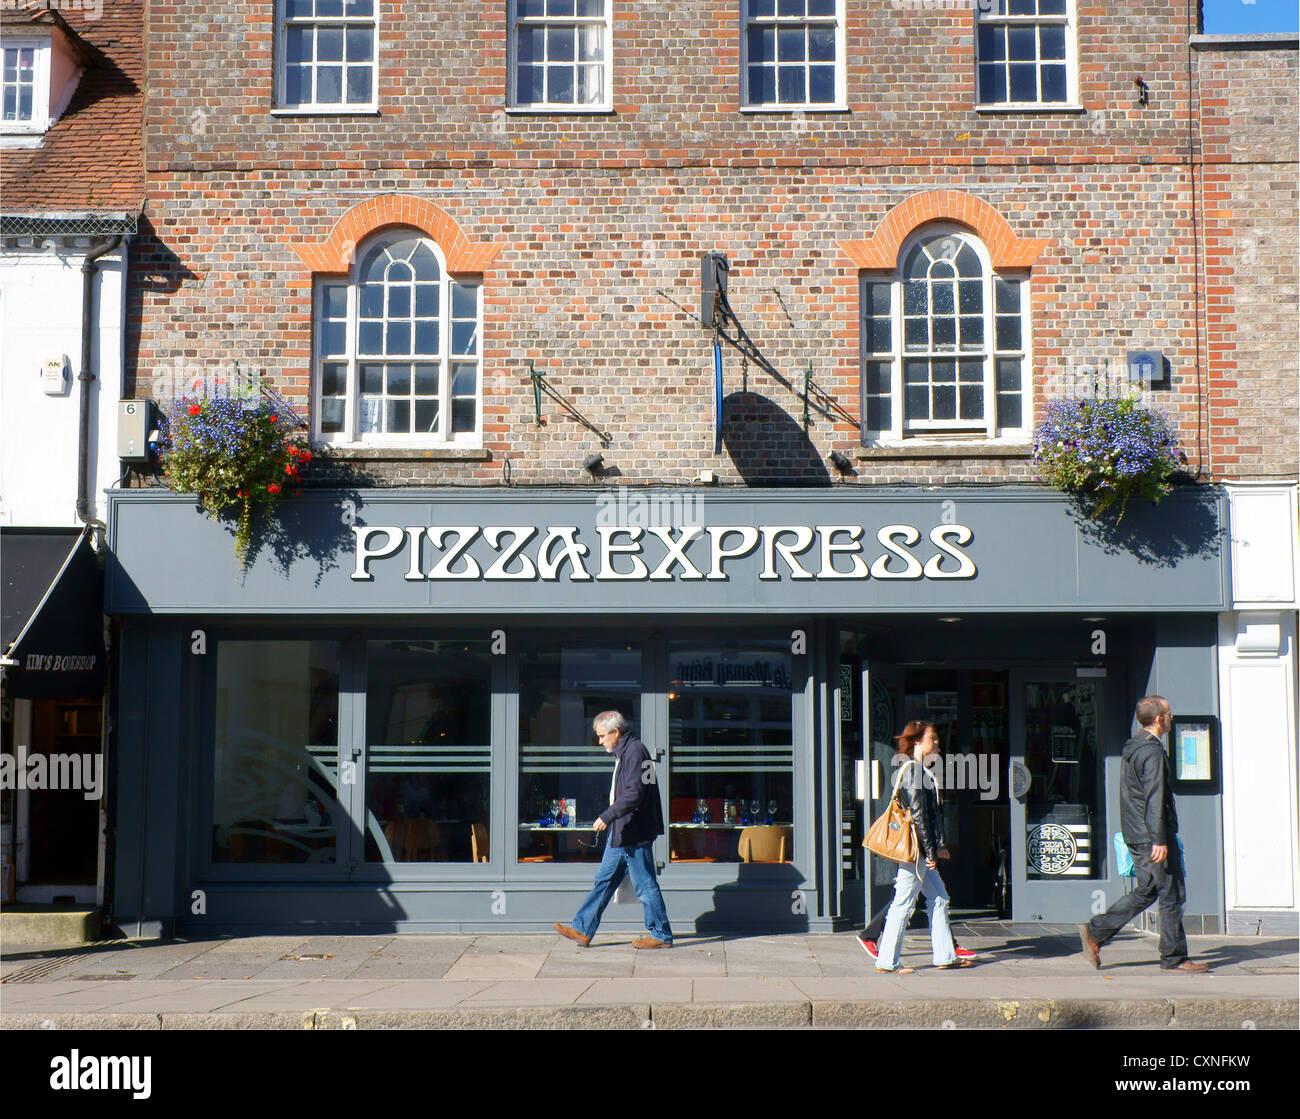 Pizza Express Restaurant In Chichester West Sussex Uk